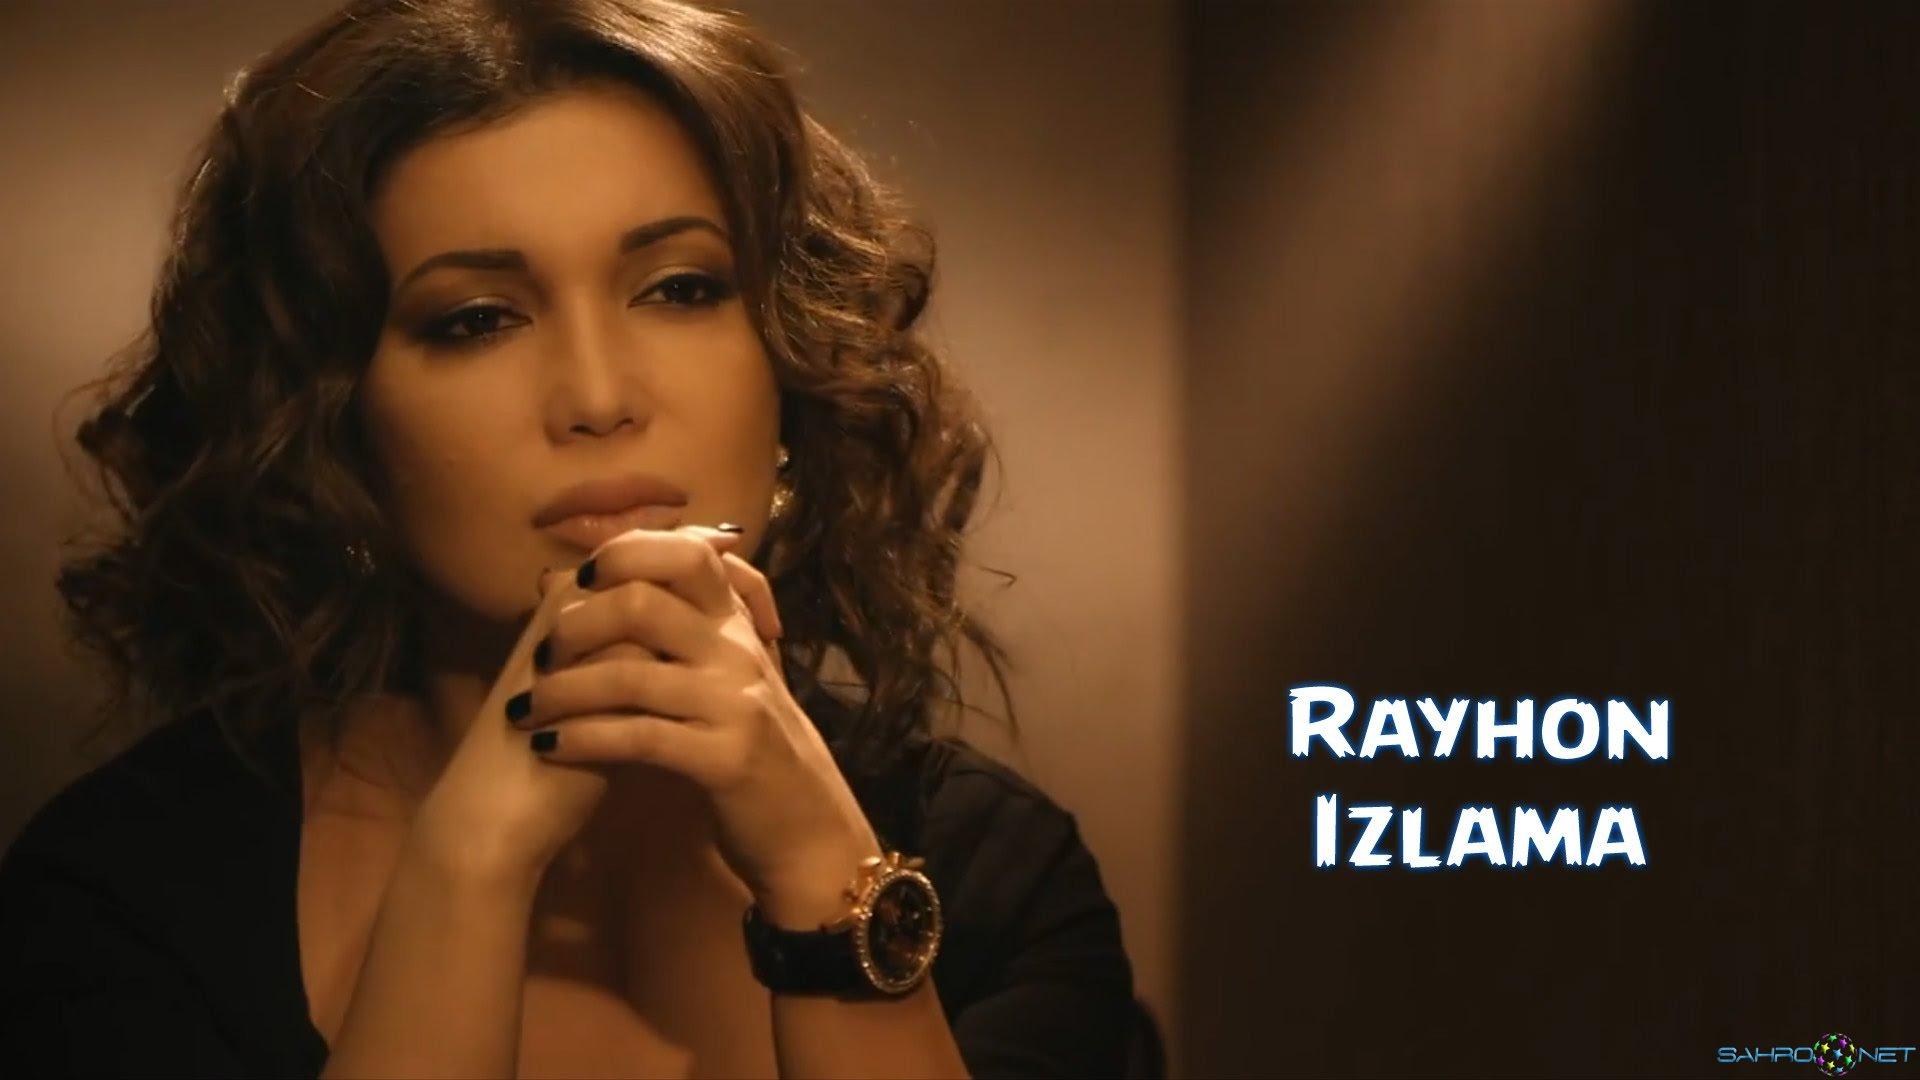 Rayhon - Izlama 2015 Янги Узбек Клип 2015